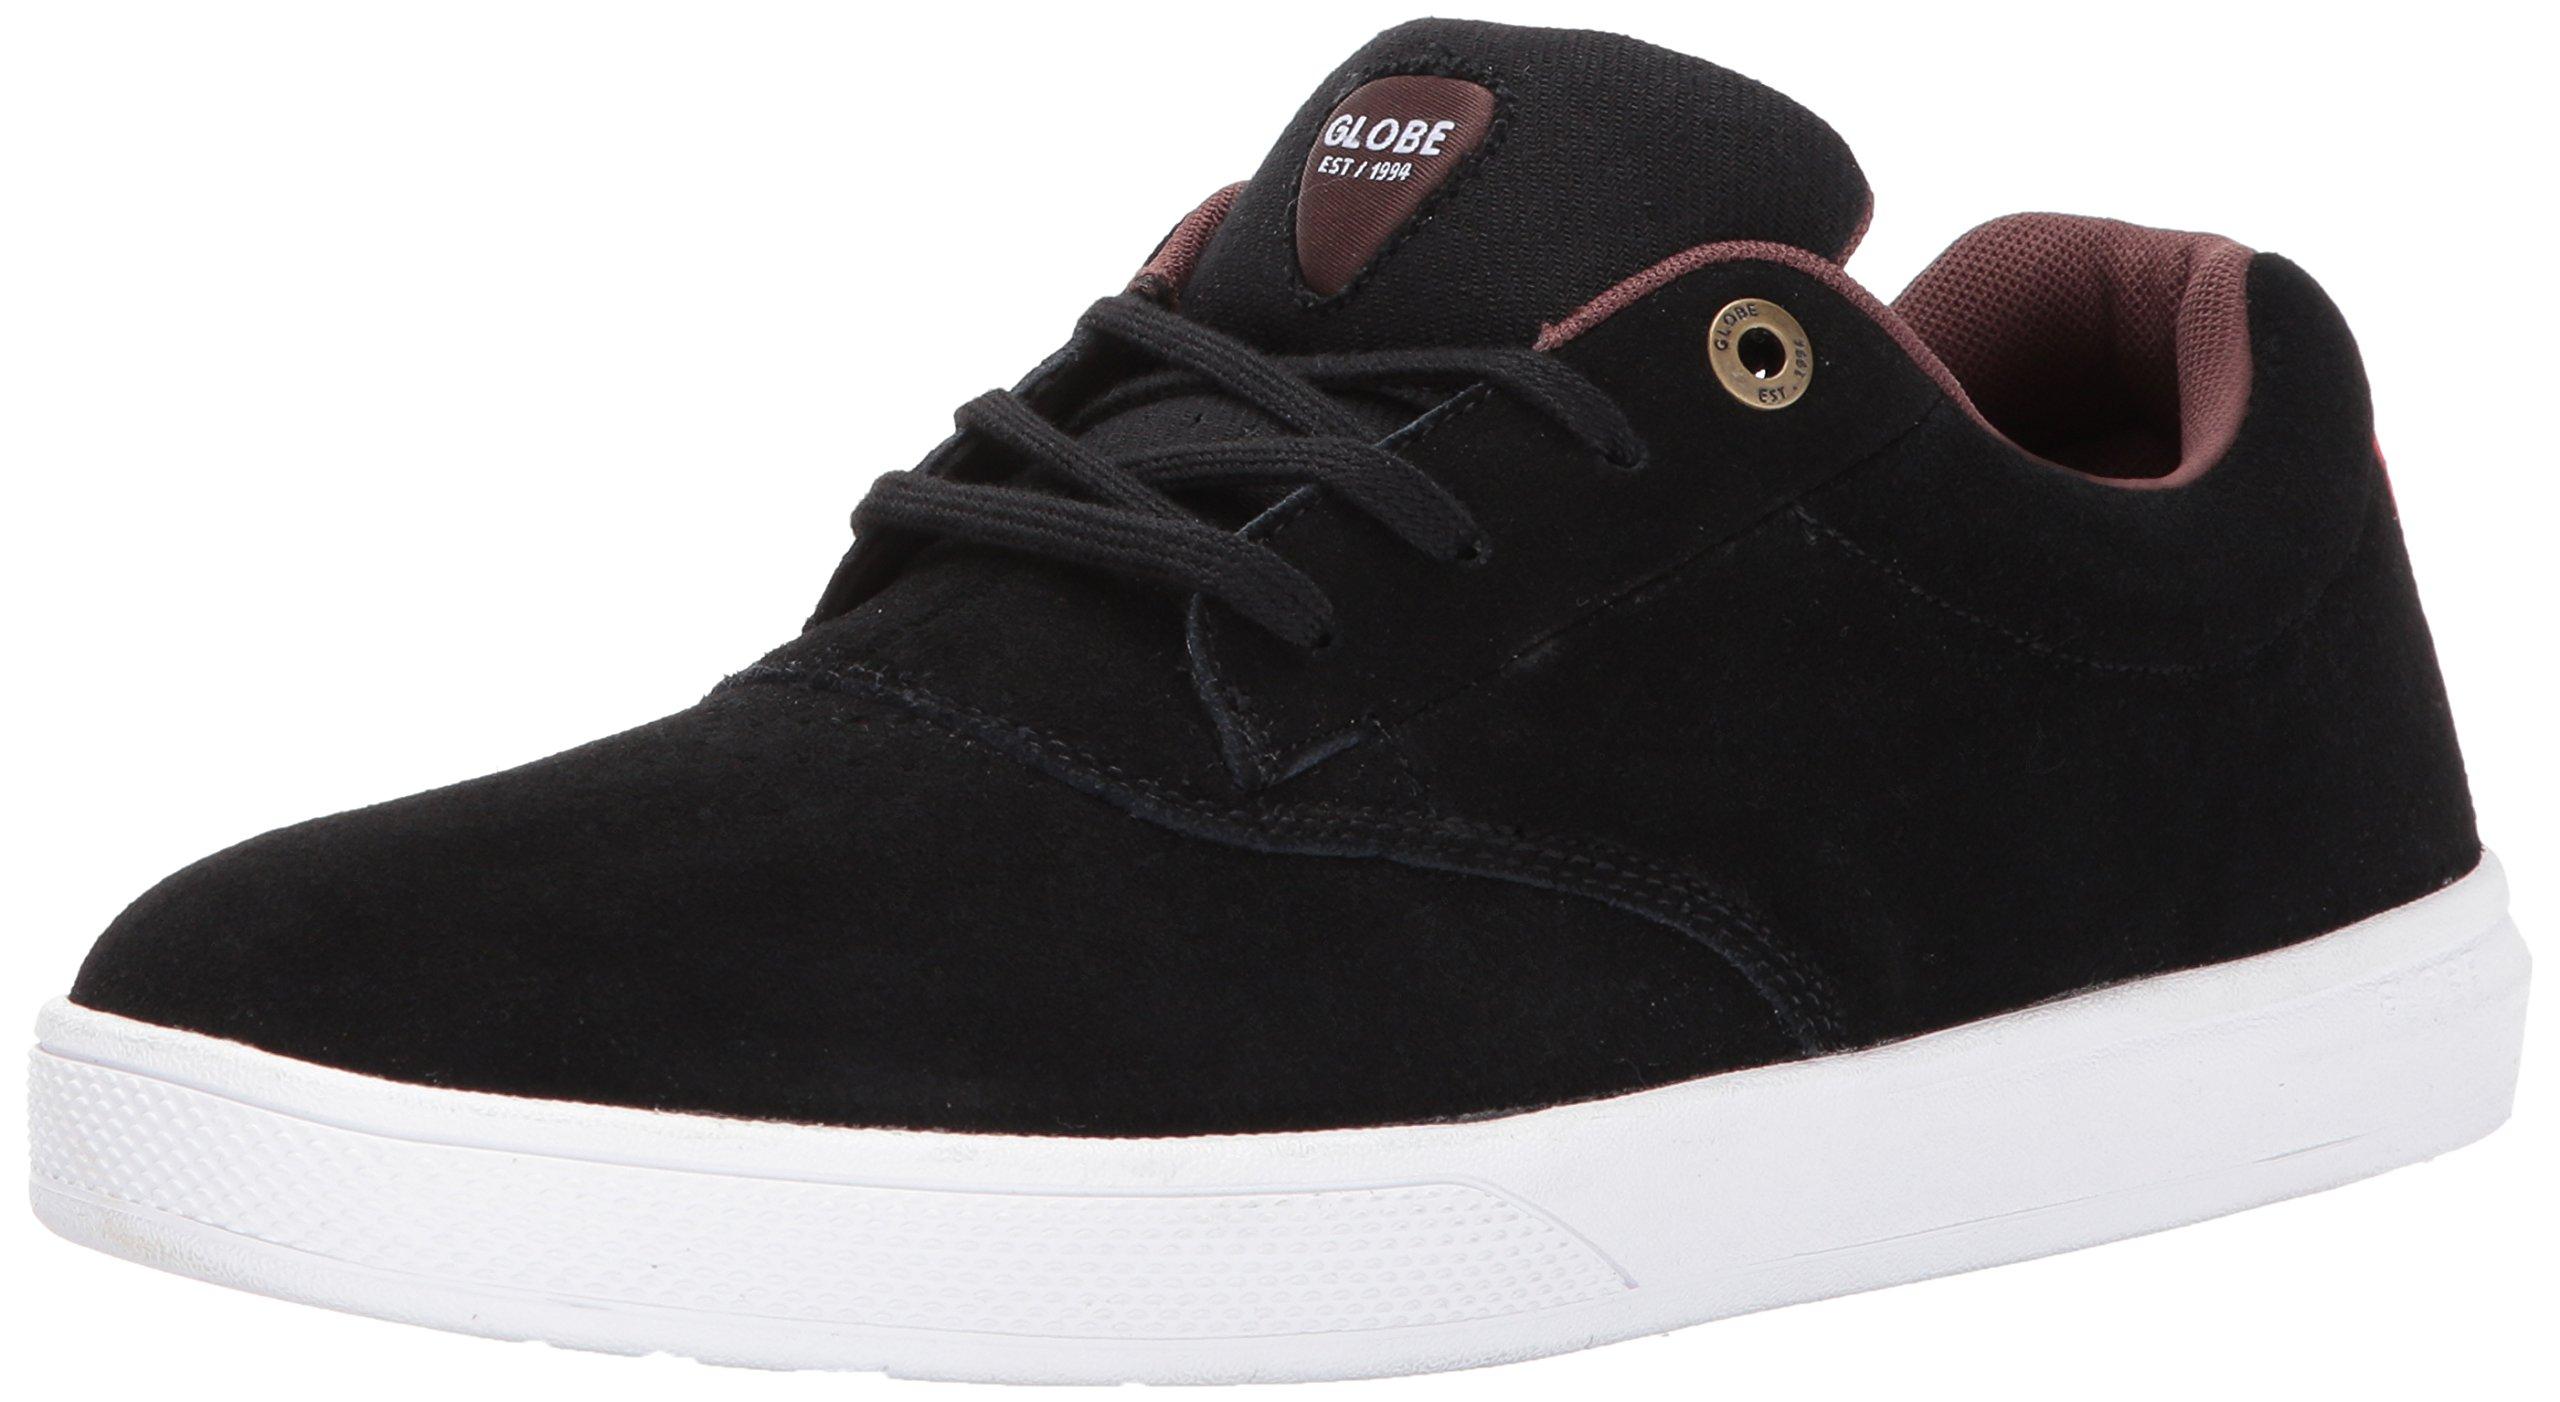 Globe Men's The Eagle SG Skate Shoe, Black/White/Tan, 9 Regular US